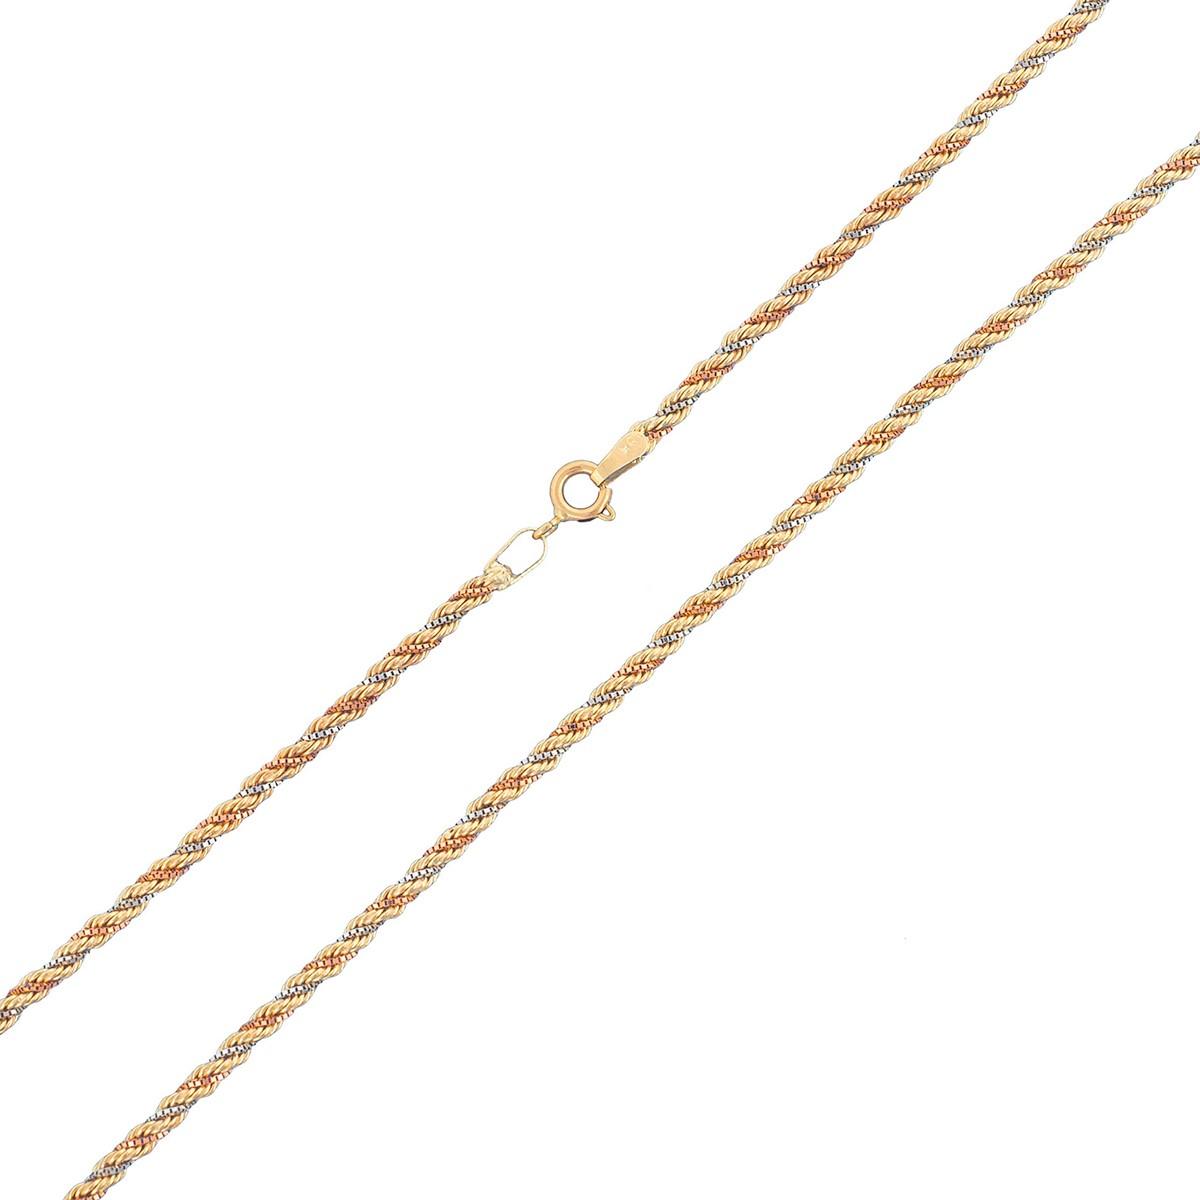 Conjunto Corrente E Pulseira Cordão Baiano Tricolor De Ouro 18k